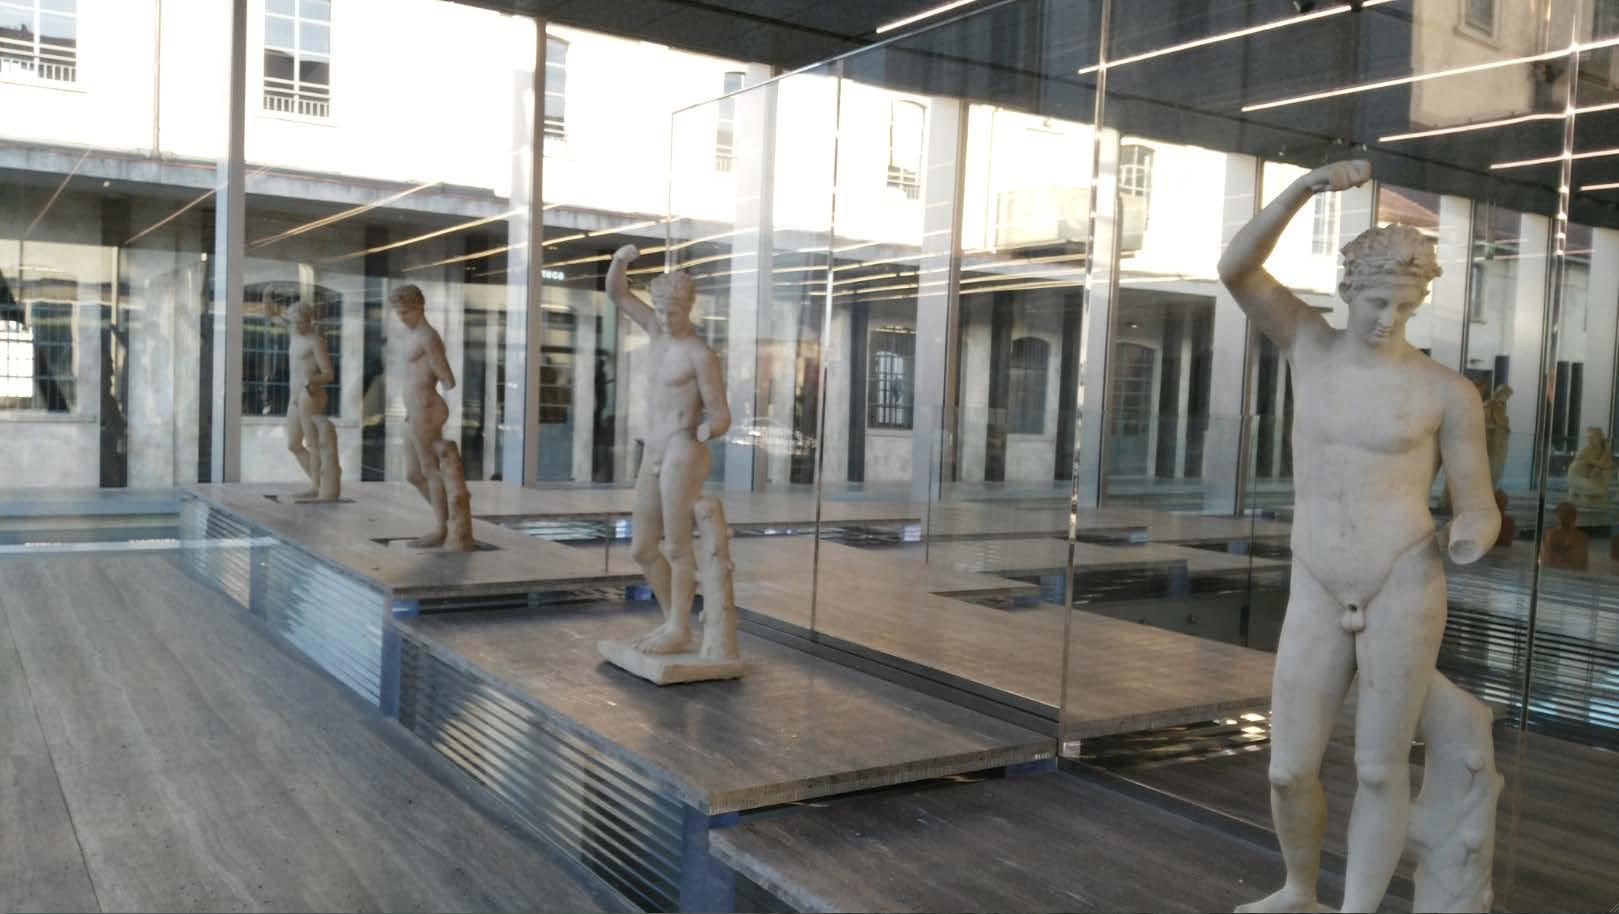 L'Armonia degli opposti: la fondazione Prada_inside_MilanoPlatinum